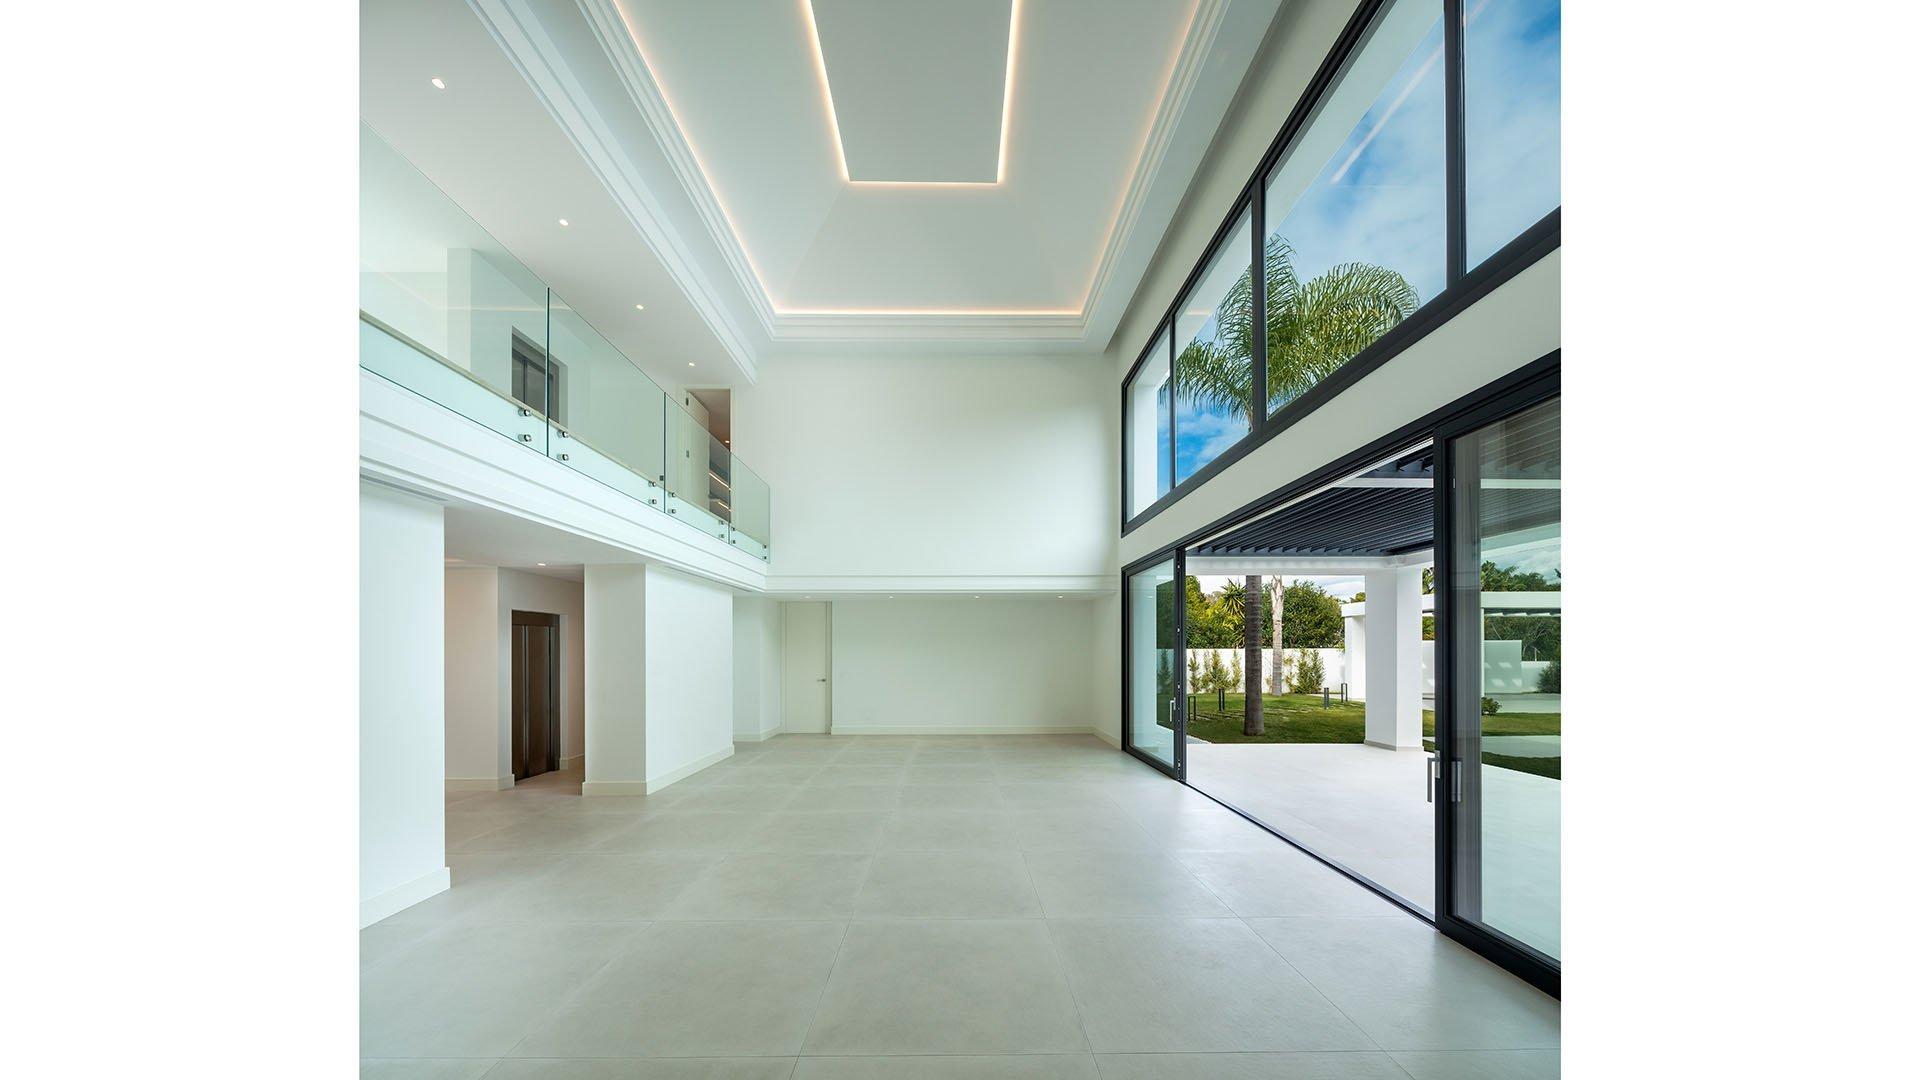 Villa Casasola 52: Spacious modern villa only 150 meters from the beach